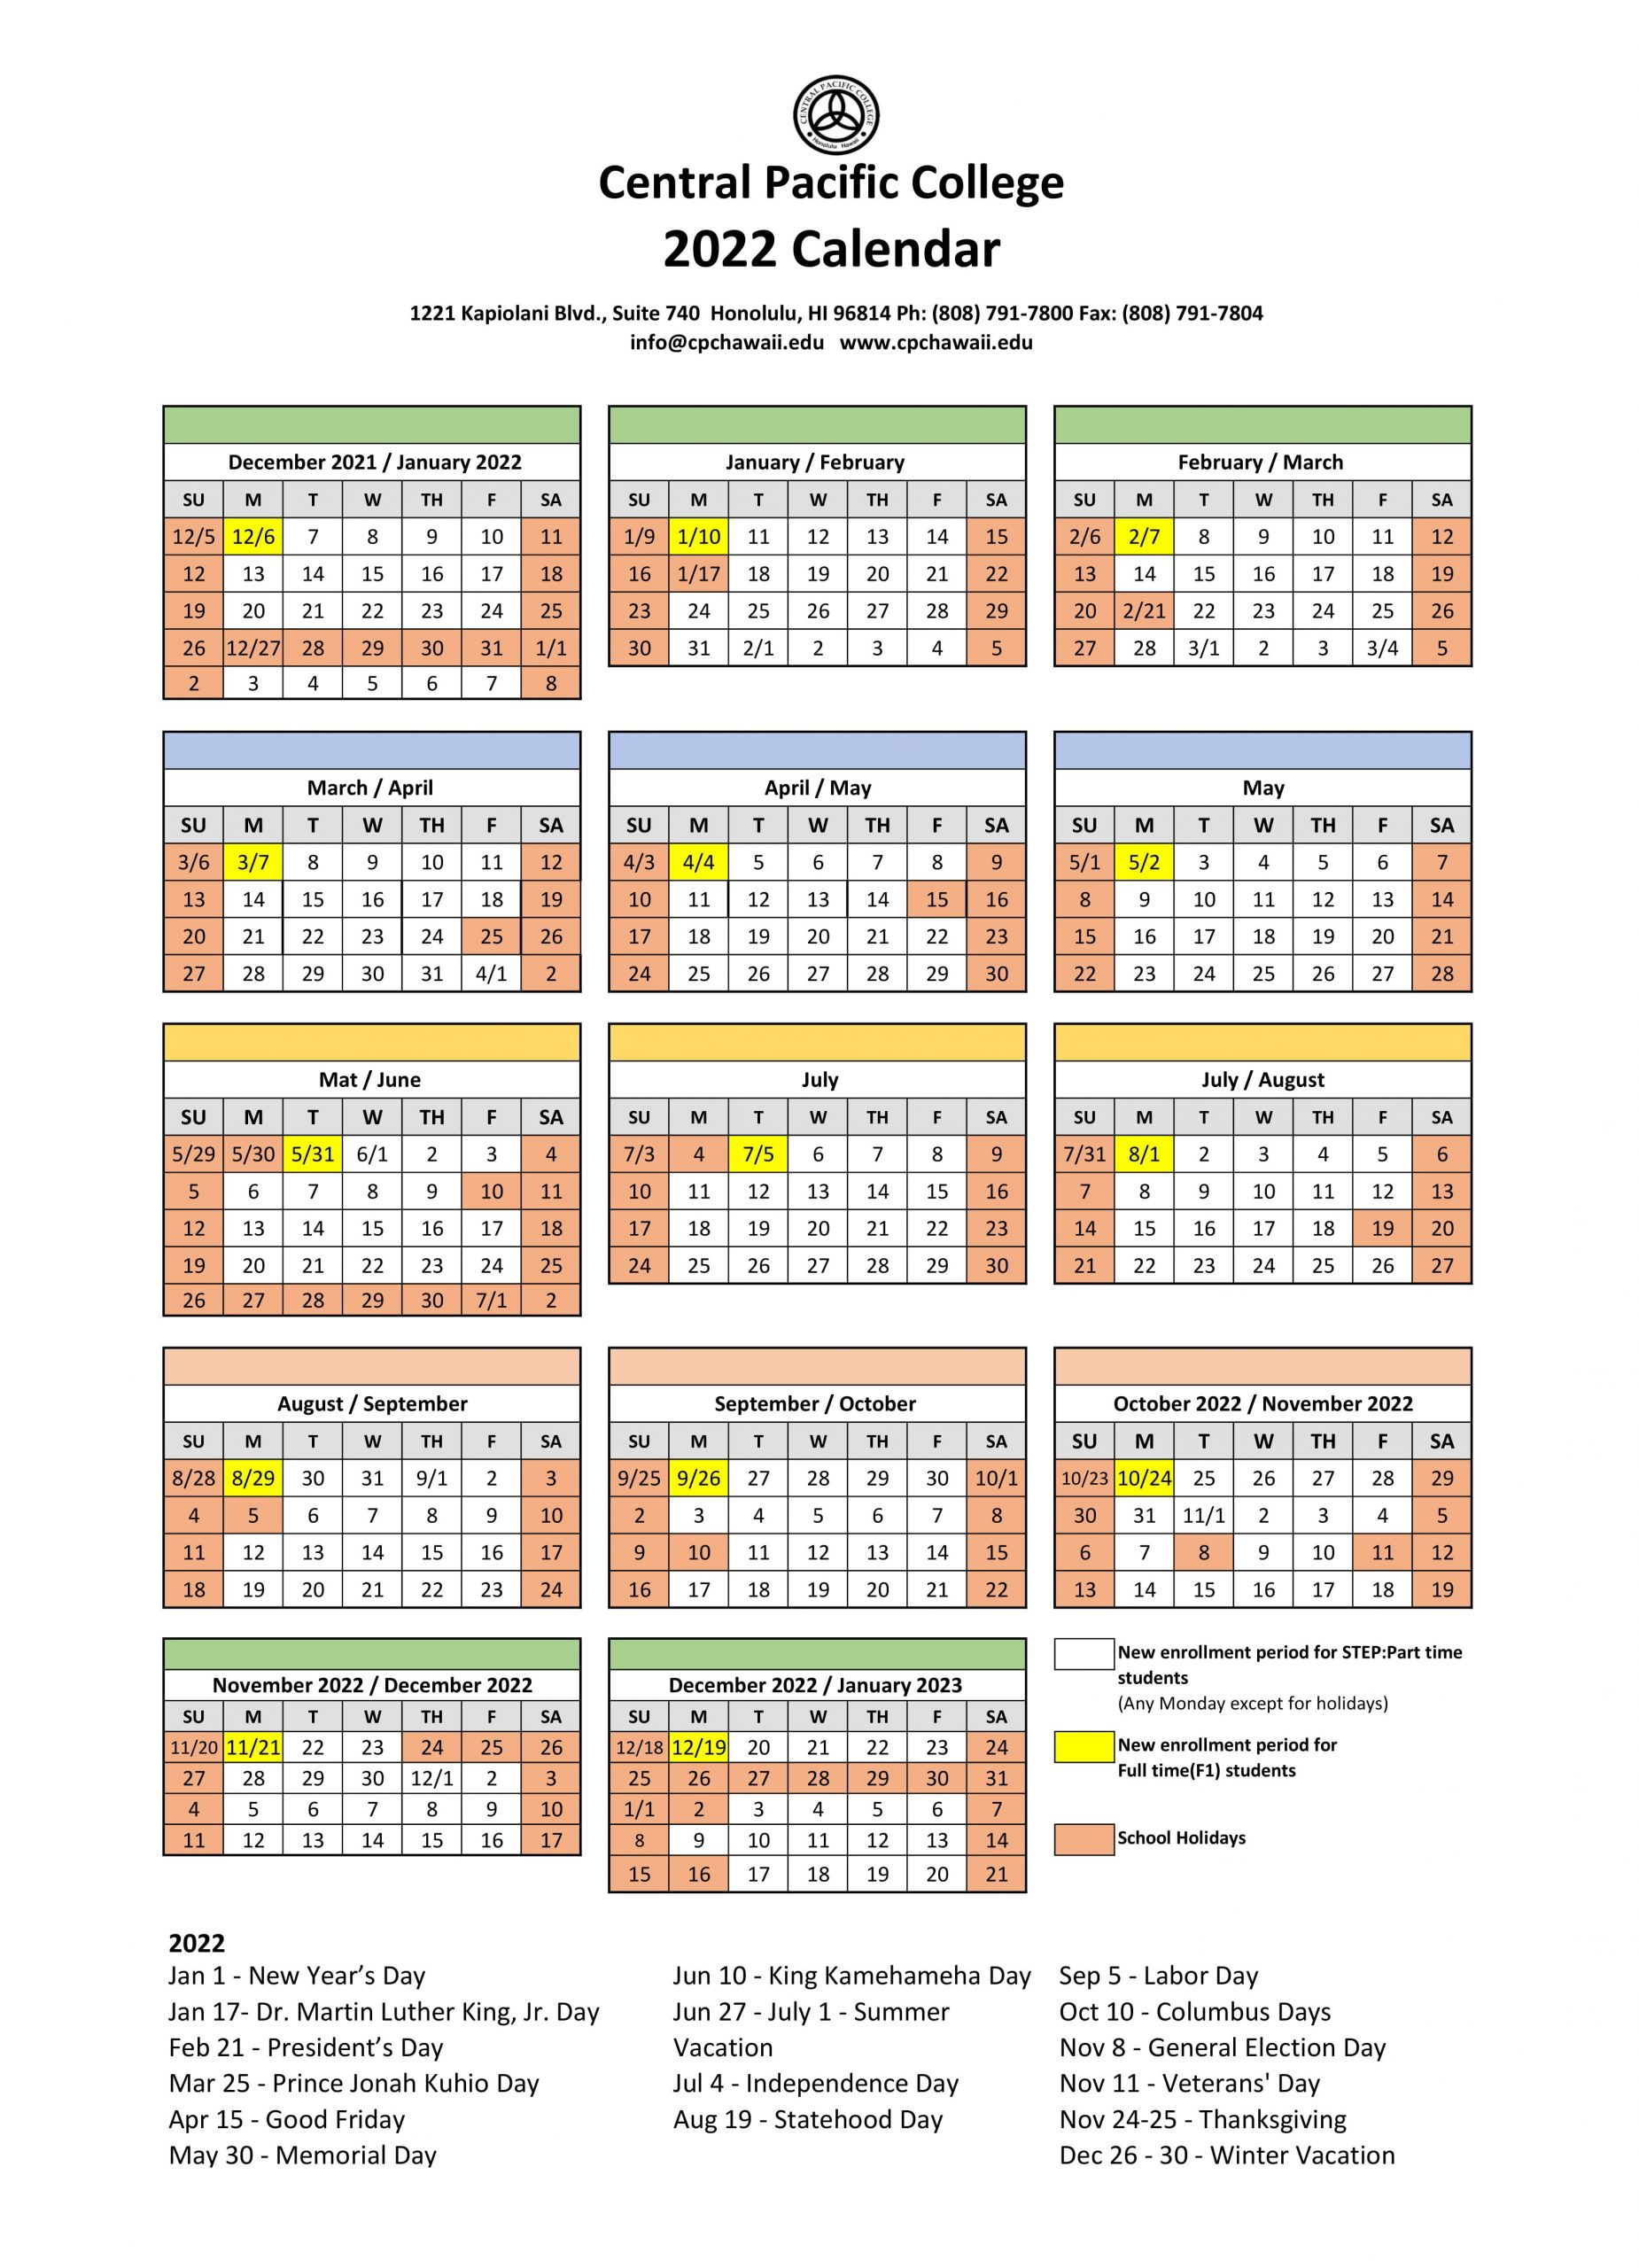 Schulplan - Central Pacific College Regarding Delaware State University 2021 2020 Calendar